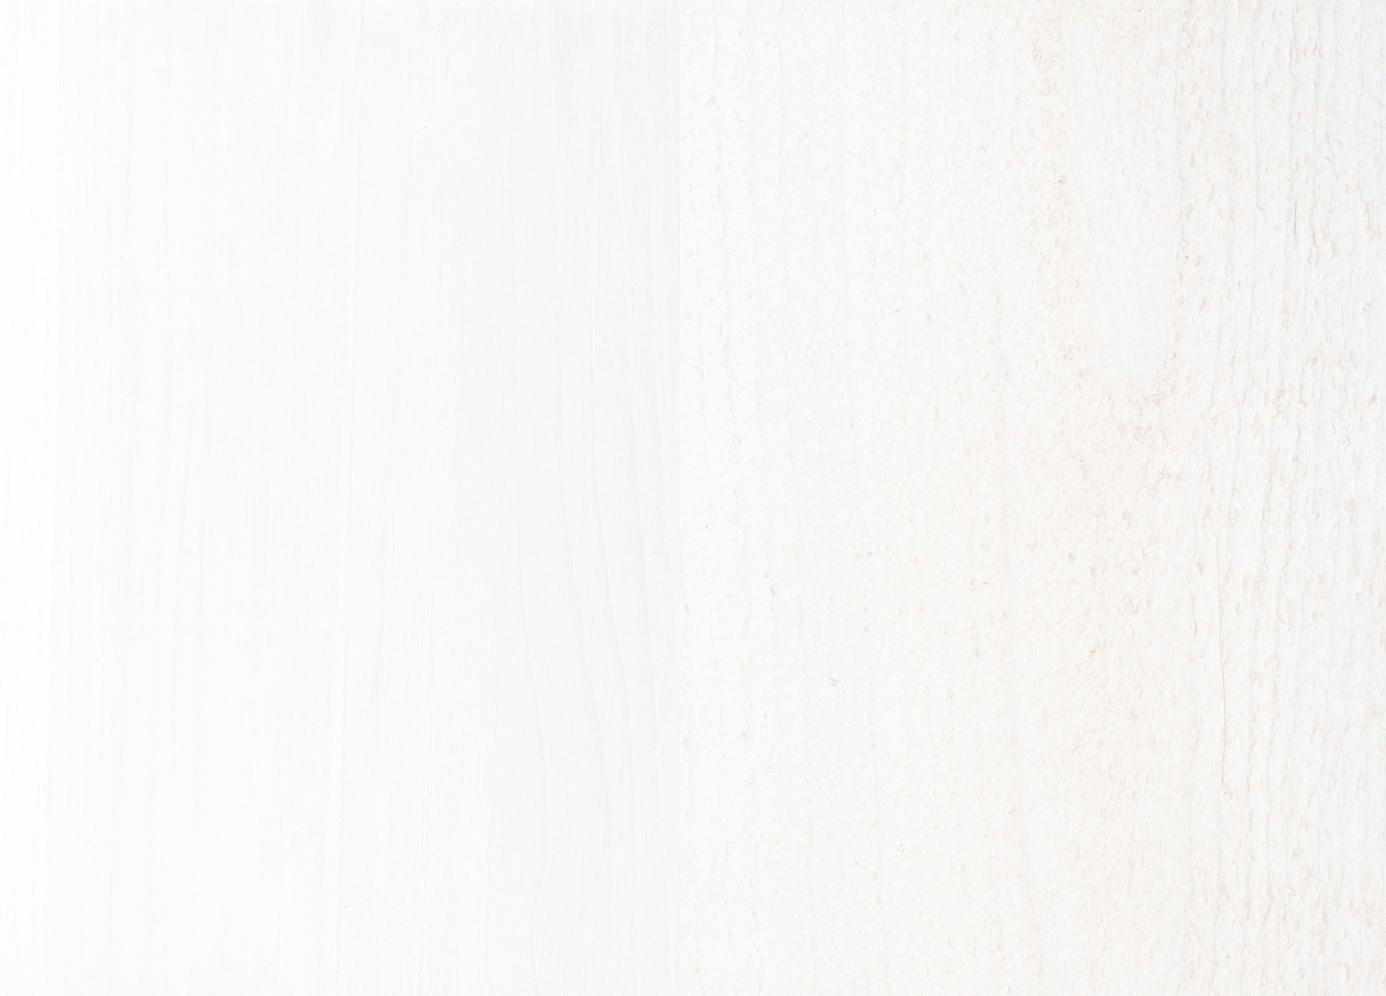 Pro Tek Tor Slt Broda Pics Photos Circuit Board Texture Drinking Glass Jpg Color White Colors 300 Opaque